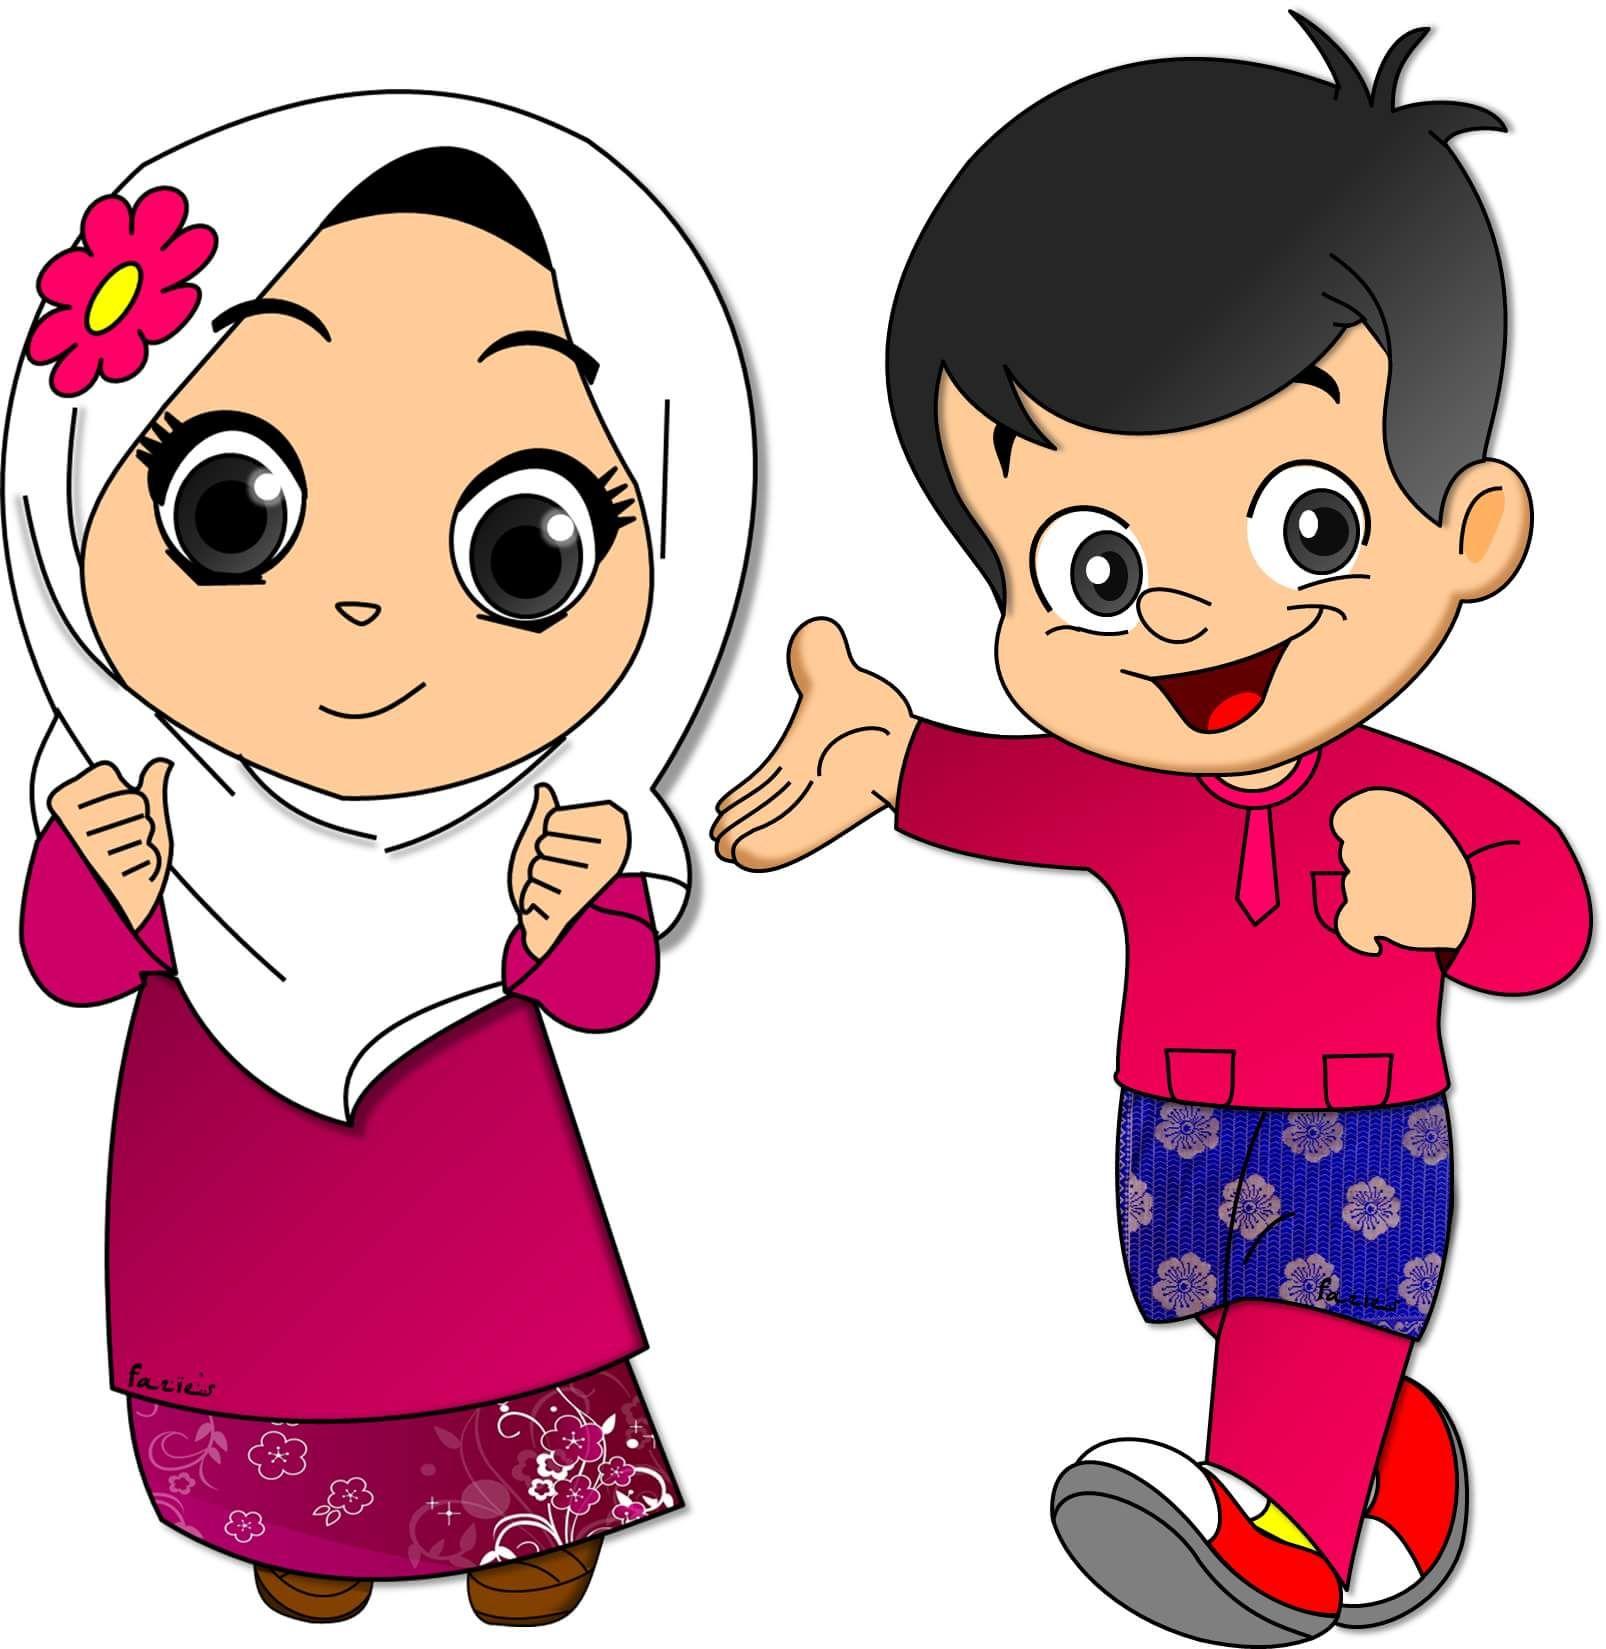 Koleksi Gambar Gambar Animasi Kartun Anak Islami Terbaru